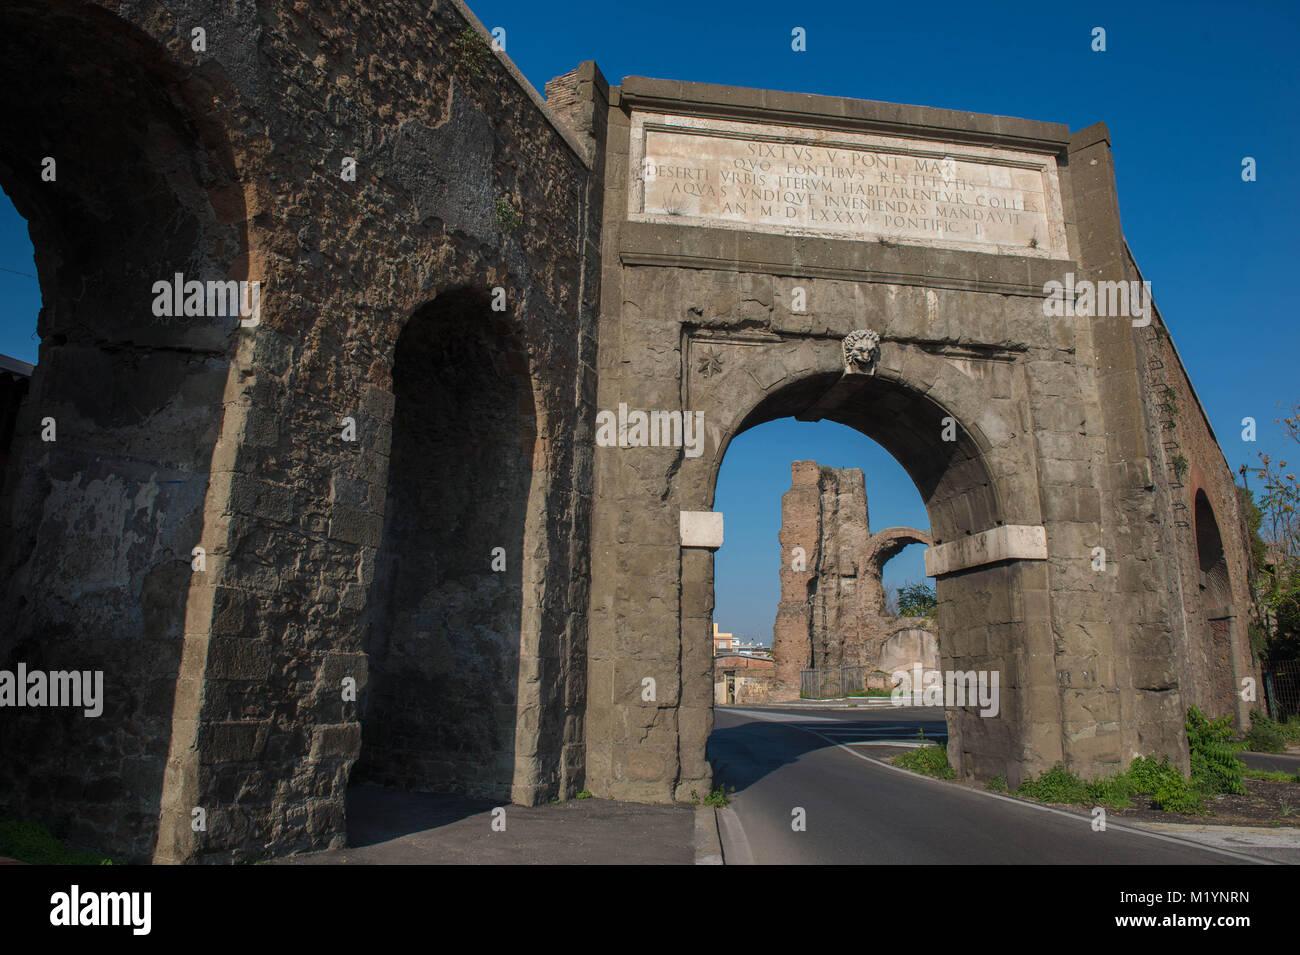 Rome, Italy. Porta Furba, where the aqueduct Acqua Felice crosses via Tuscolana. - Stock Image